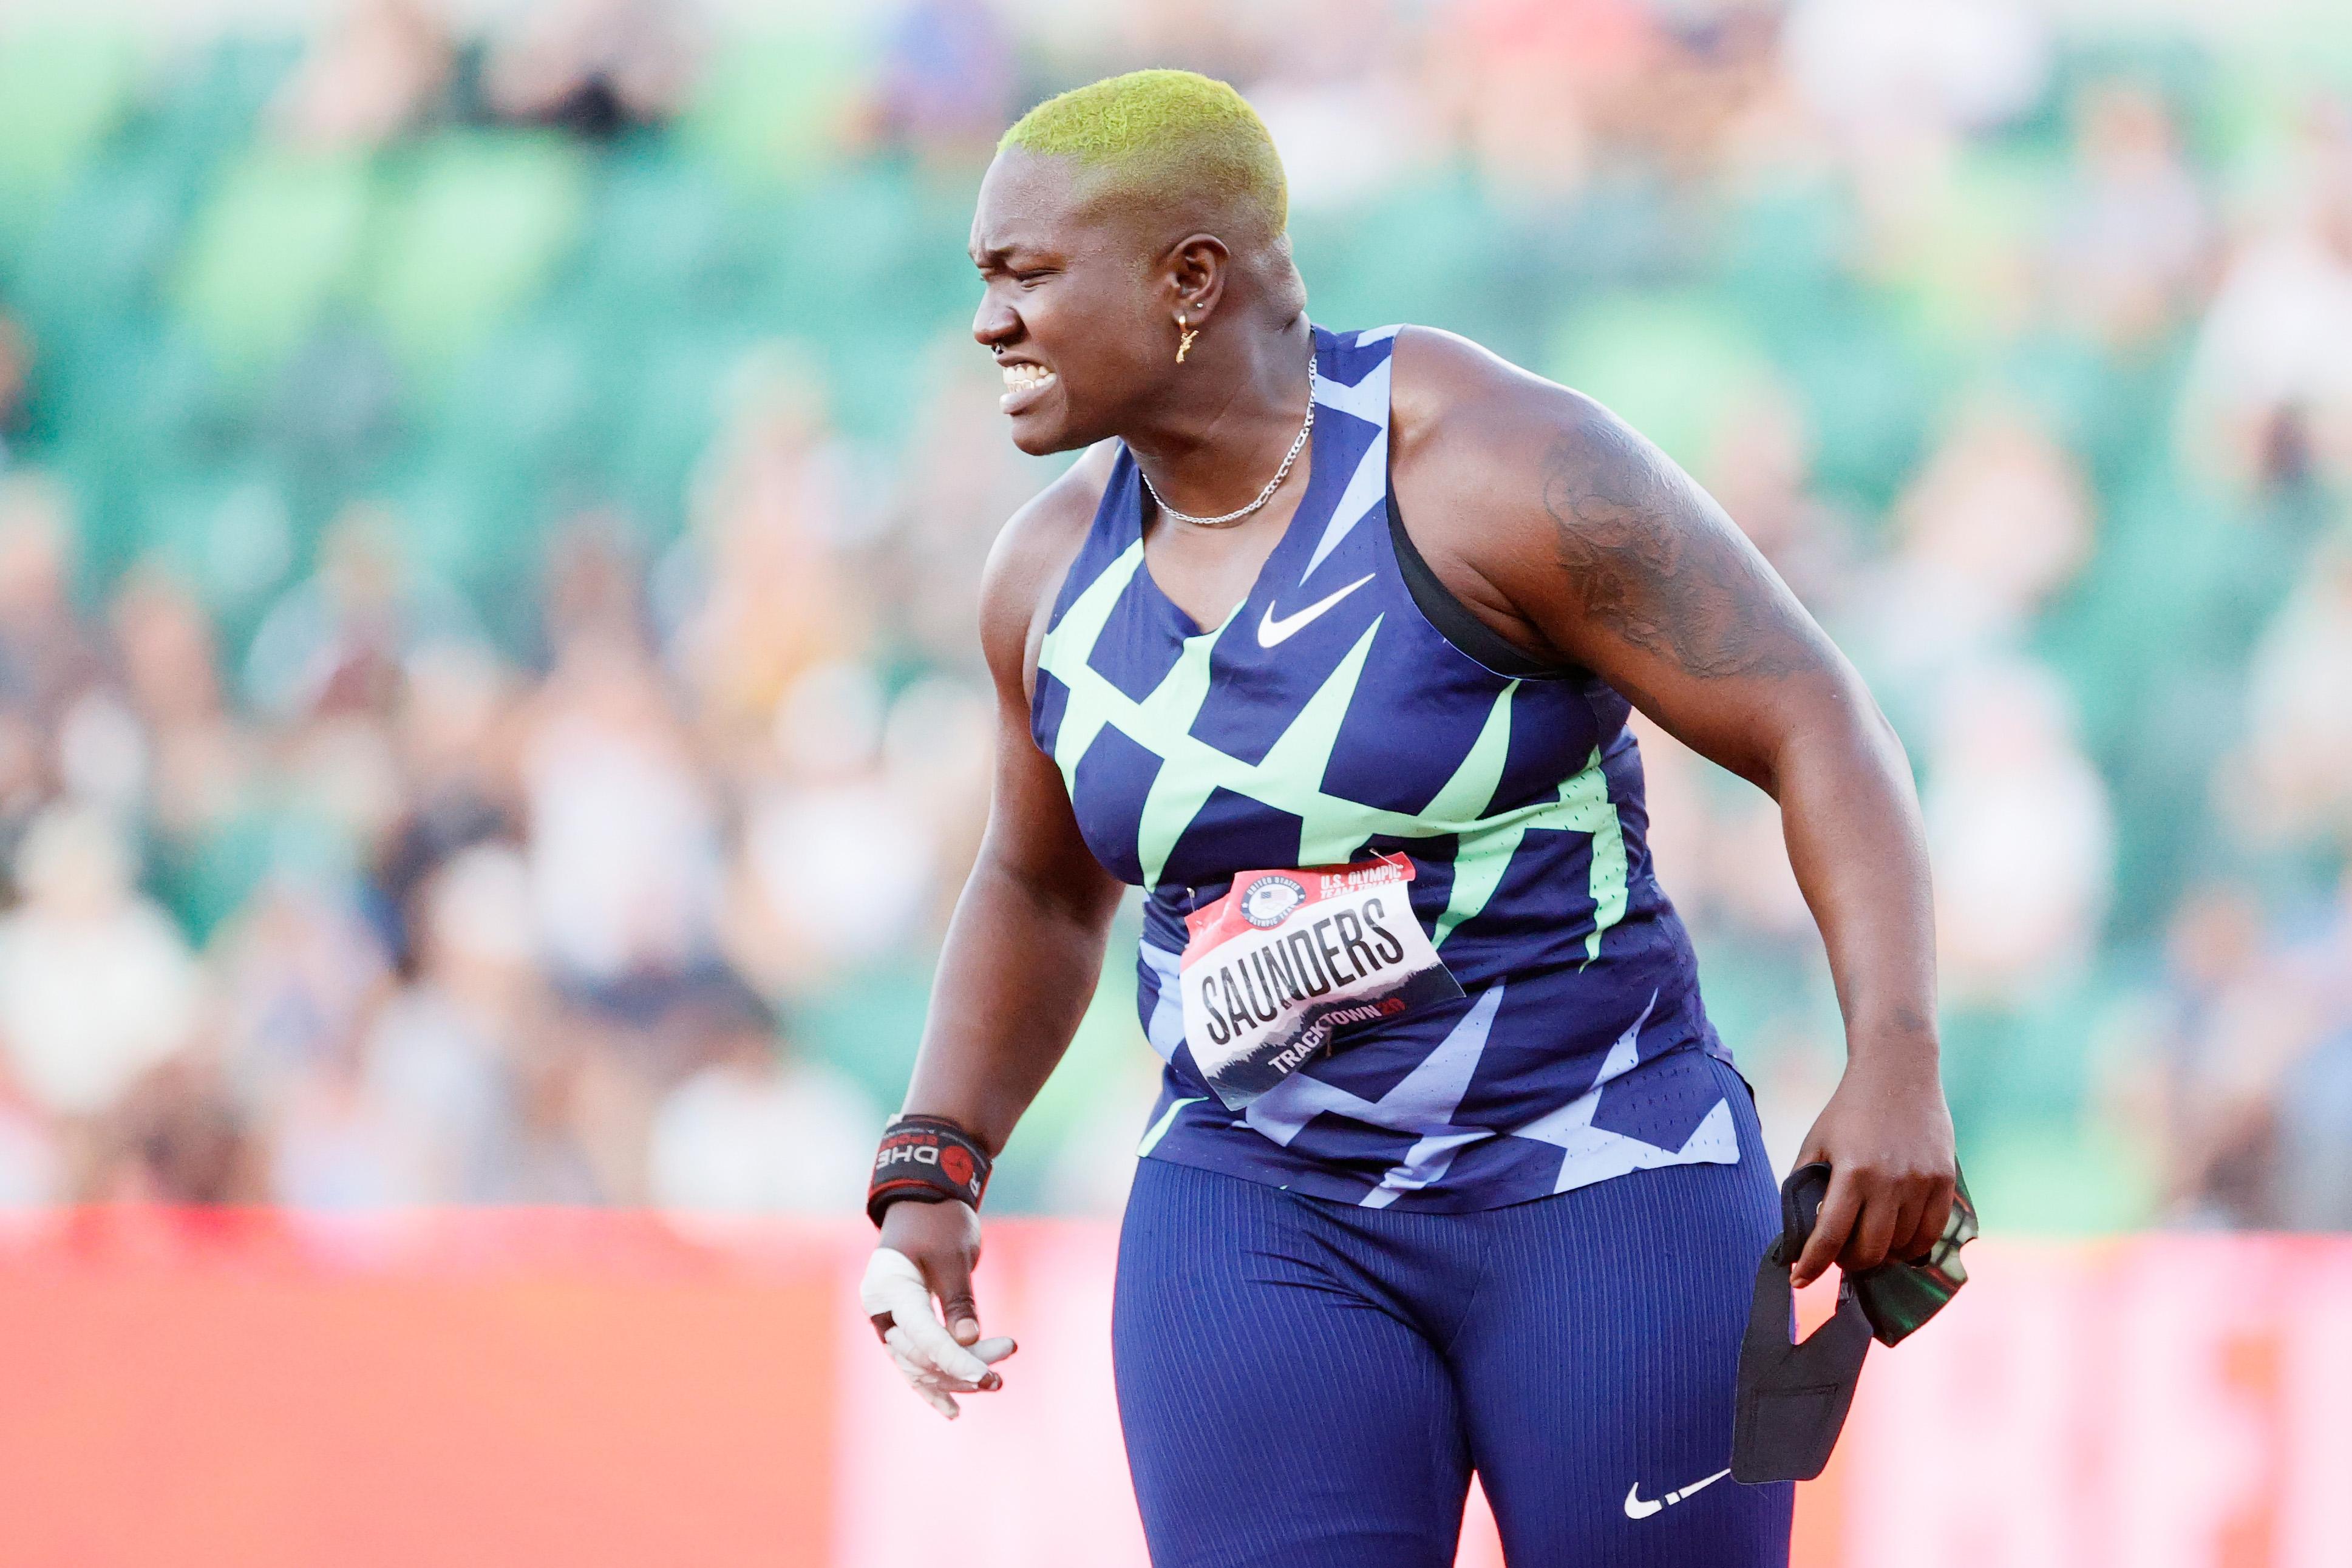 2020 U.S. Olympic Track & Field Team Trials - Day 7